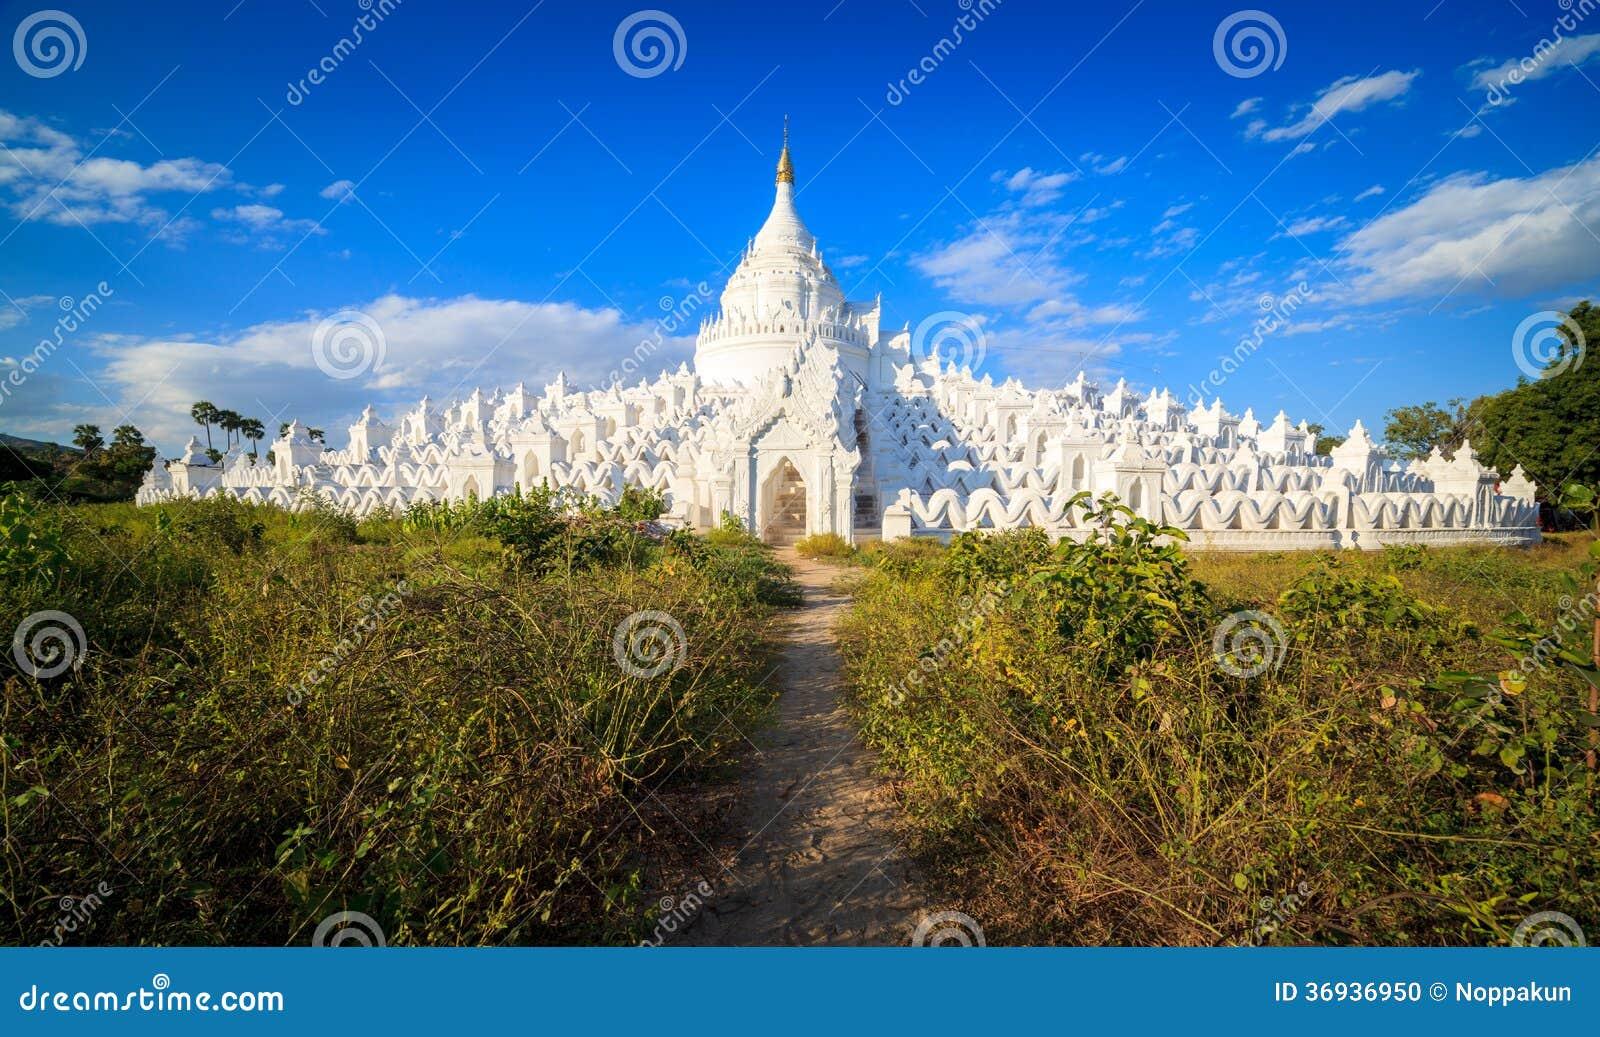 Panorama Hsinbyume pagoda, Mingun, Mandalay, Myanmar